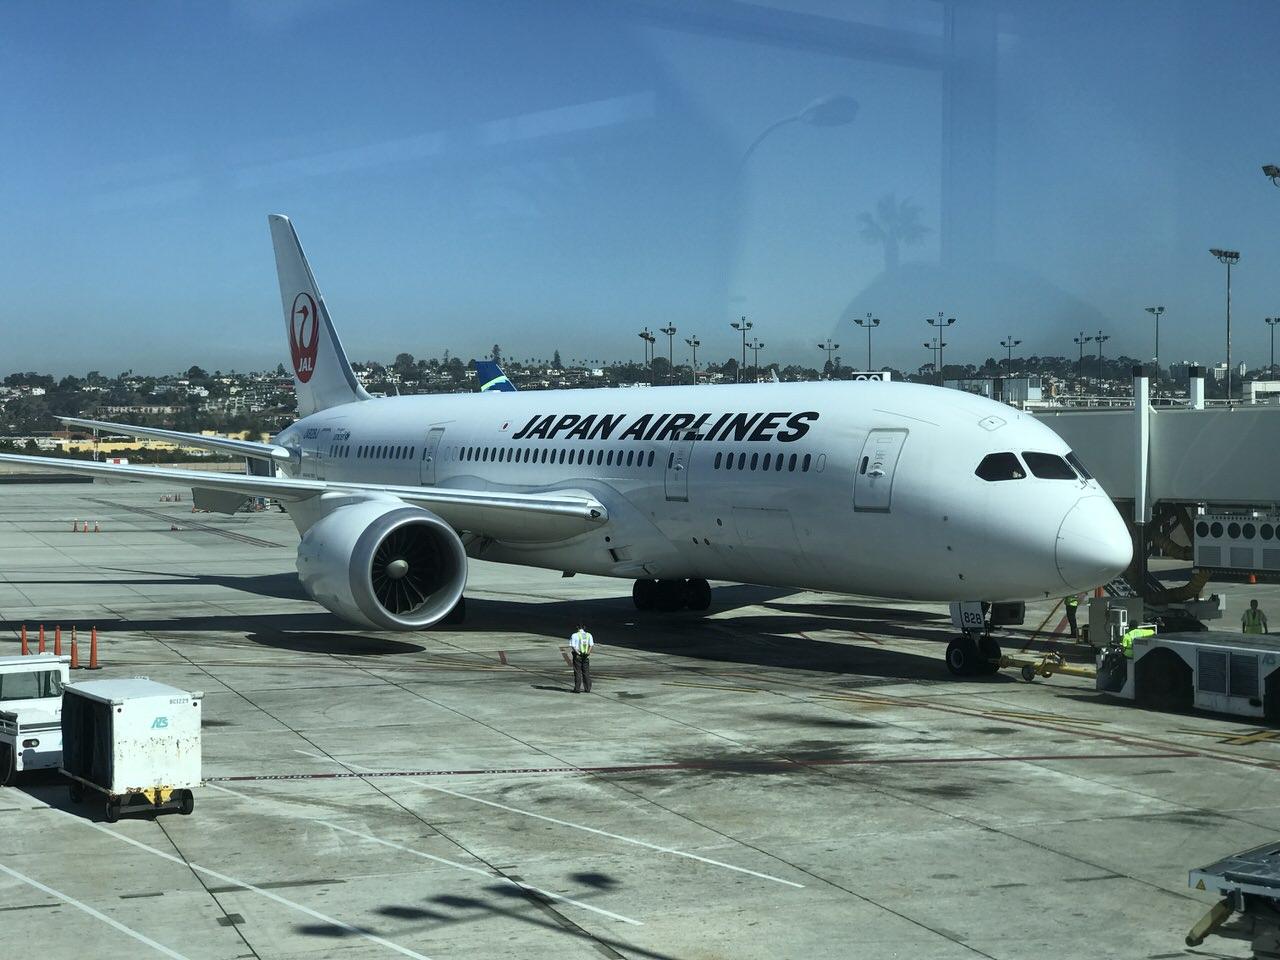 【JAL】サンディエゴ空港から成田空港へ【JL66】 #AdobeMAX